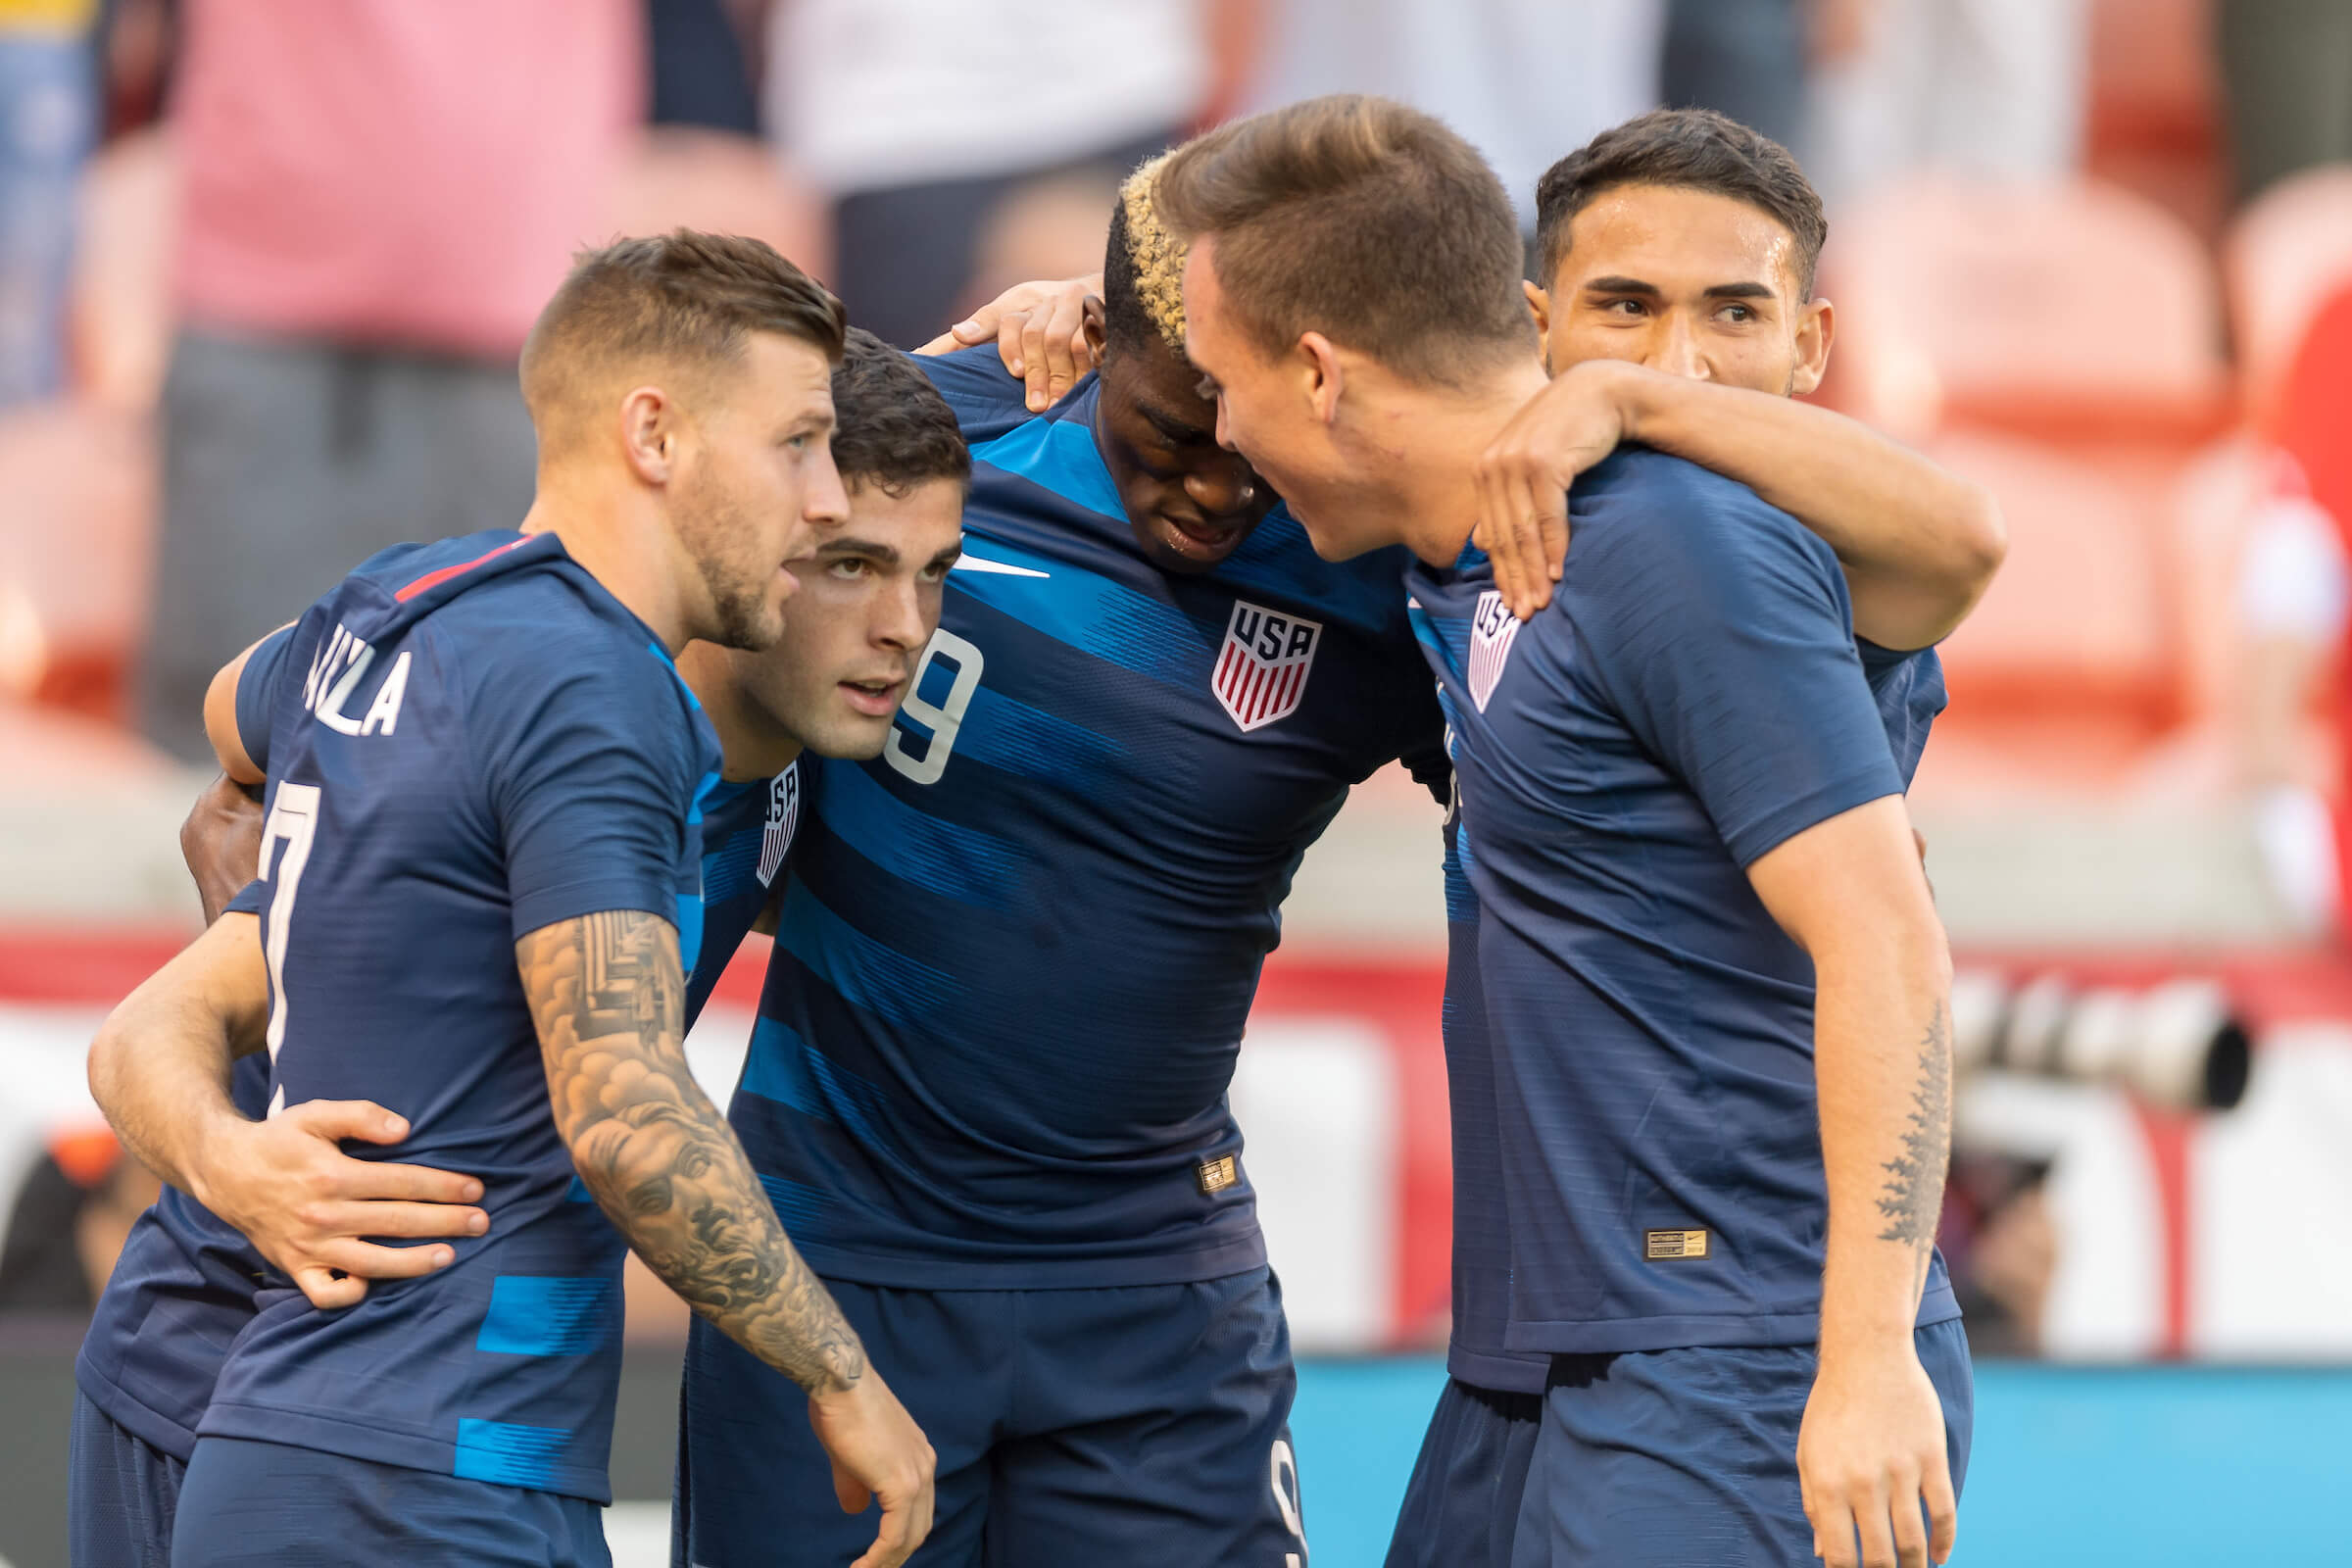 US national team cancel winter training camp in Qatar